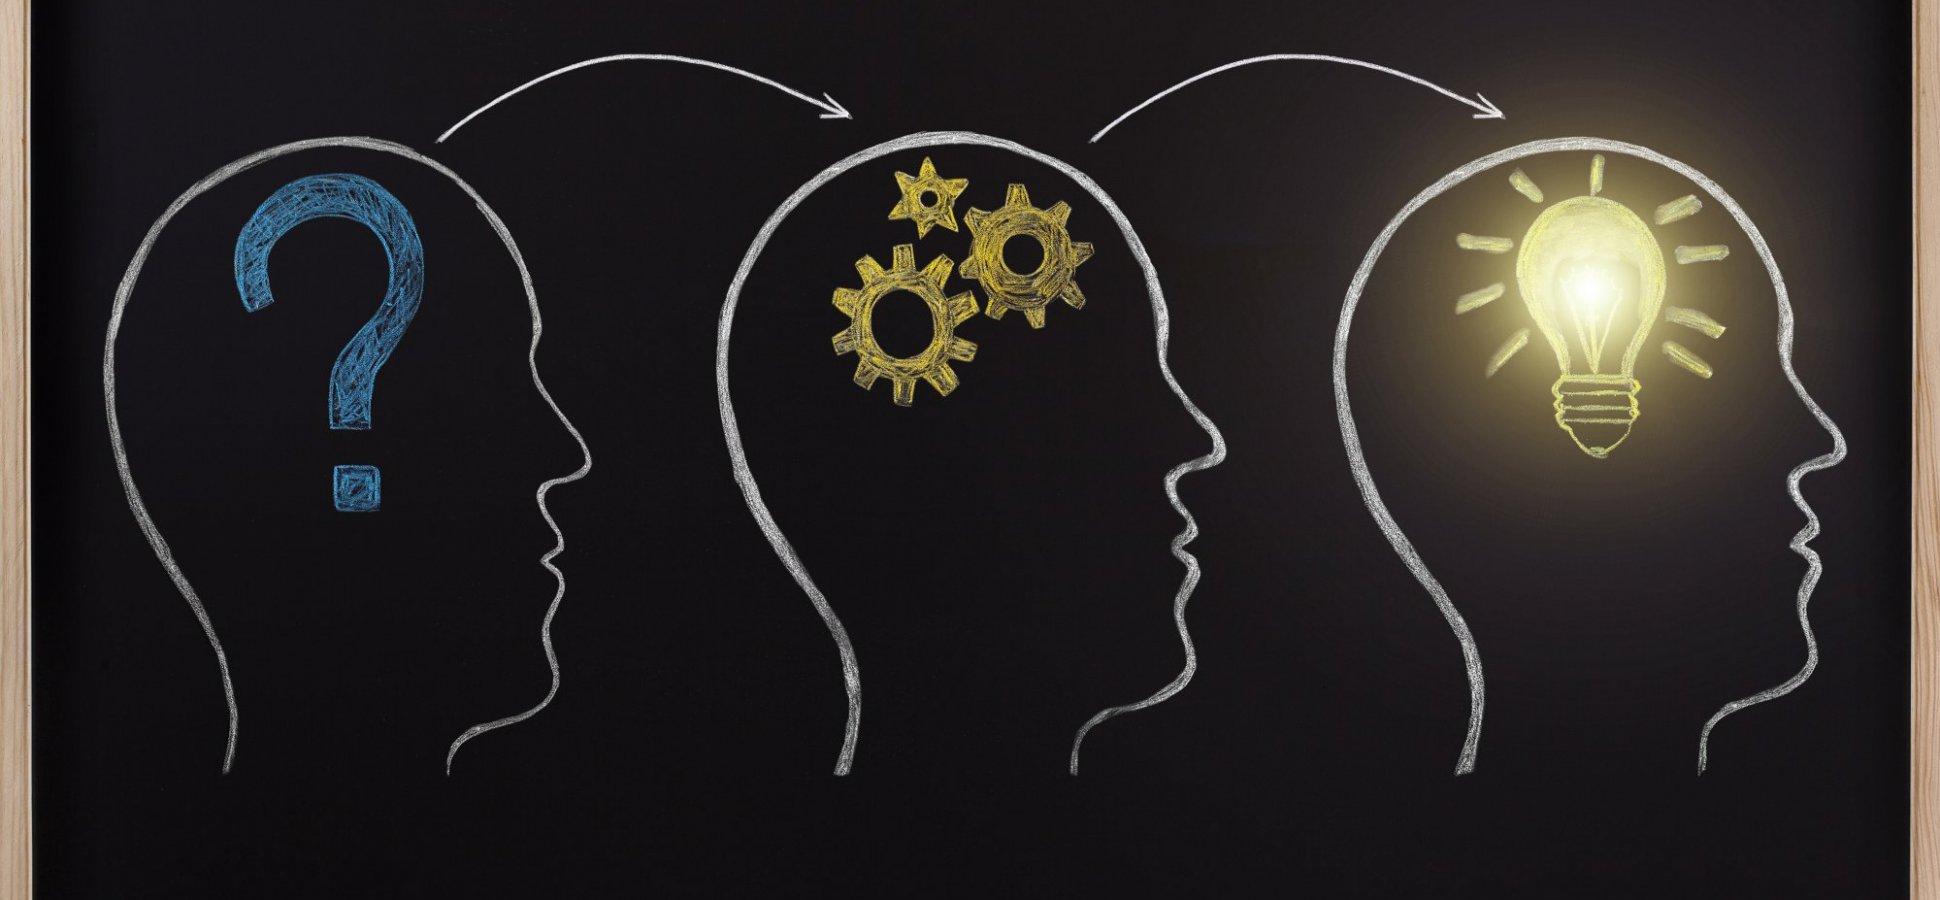 3 Dangerous Management Beliefs You Need to Immediately Destroy